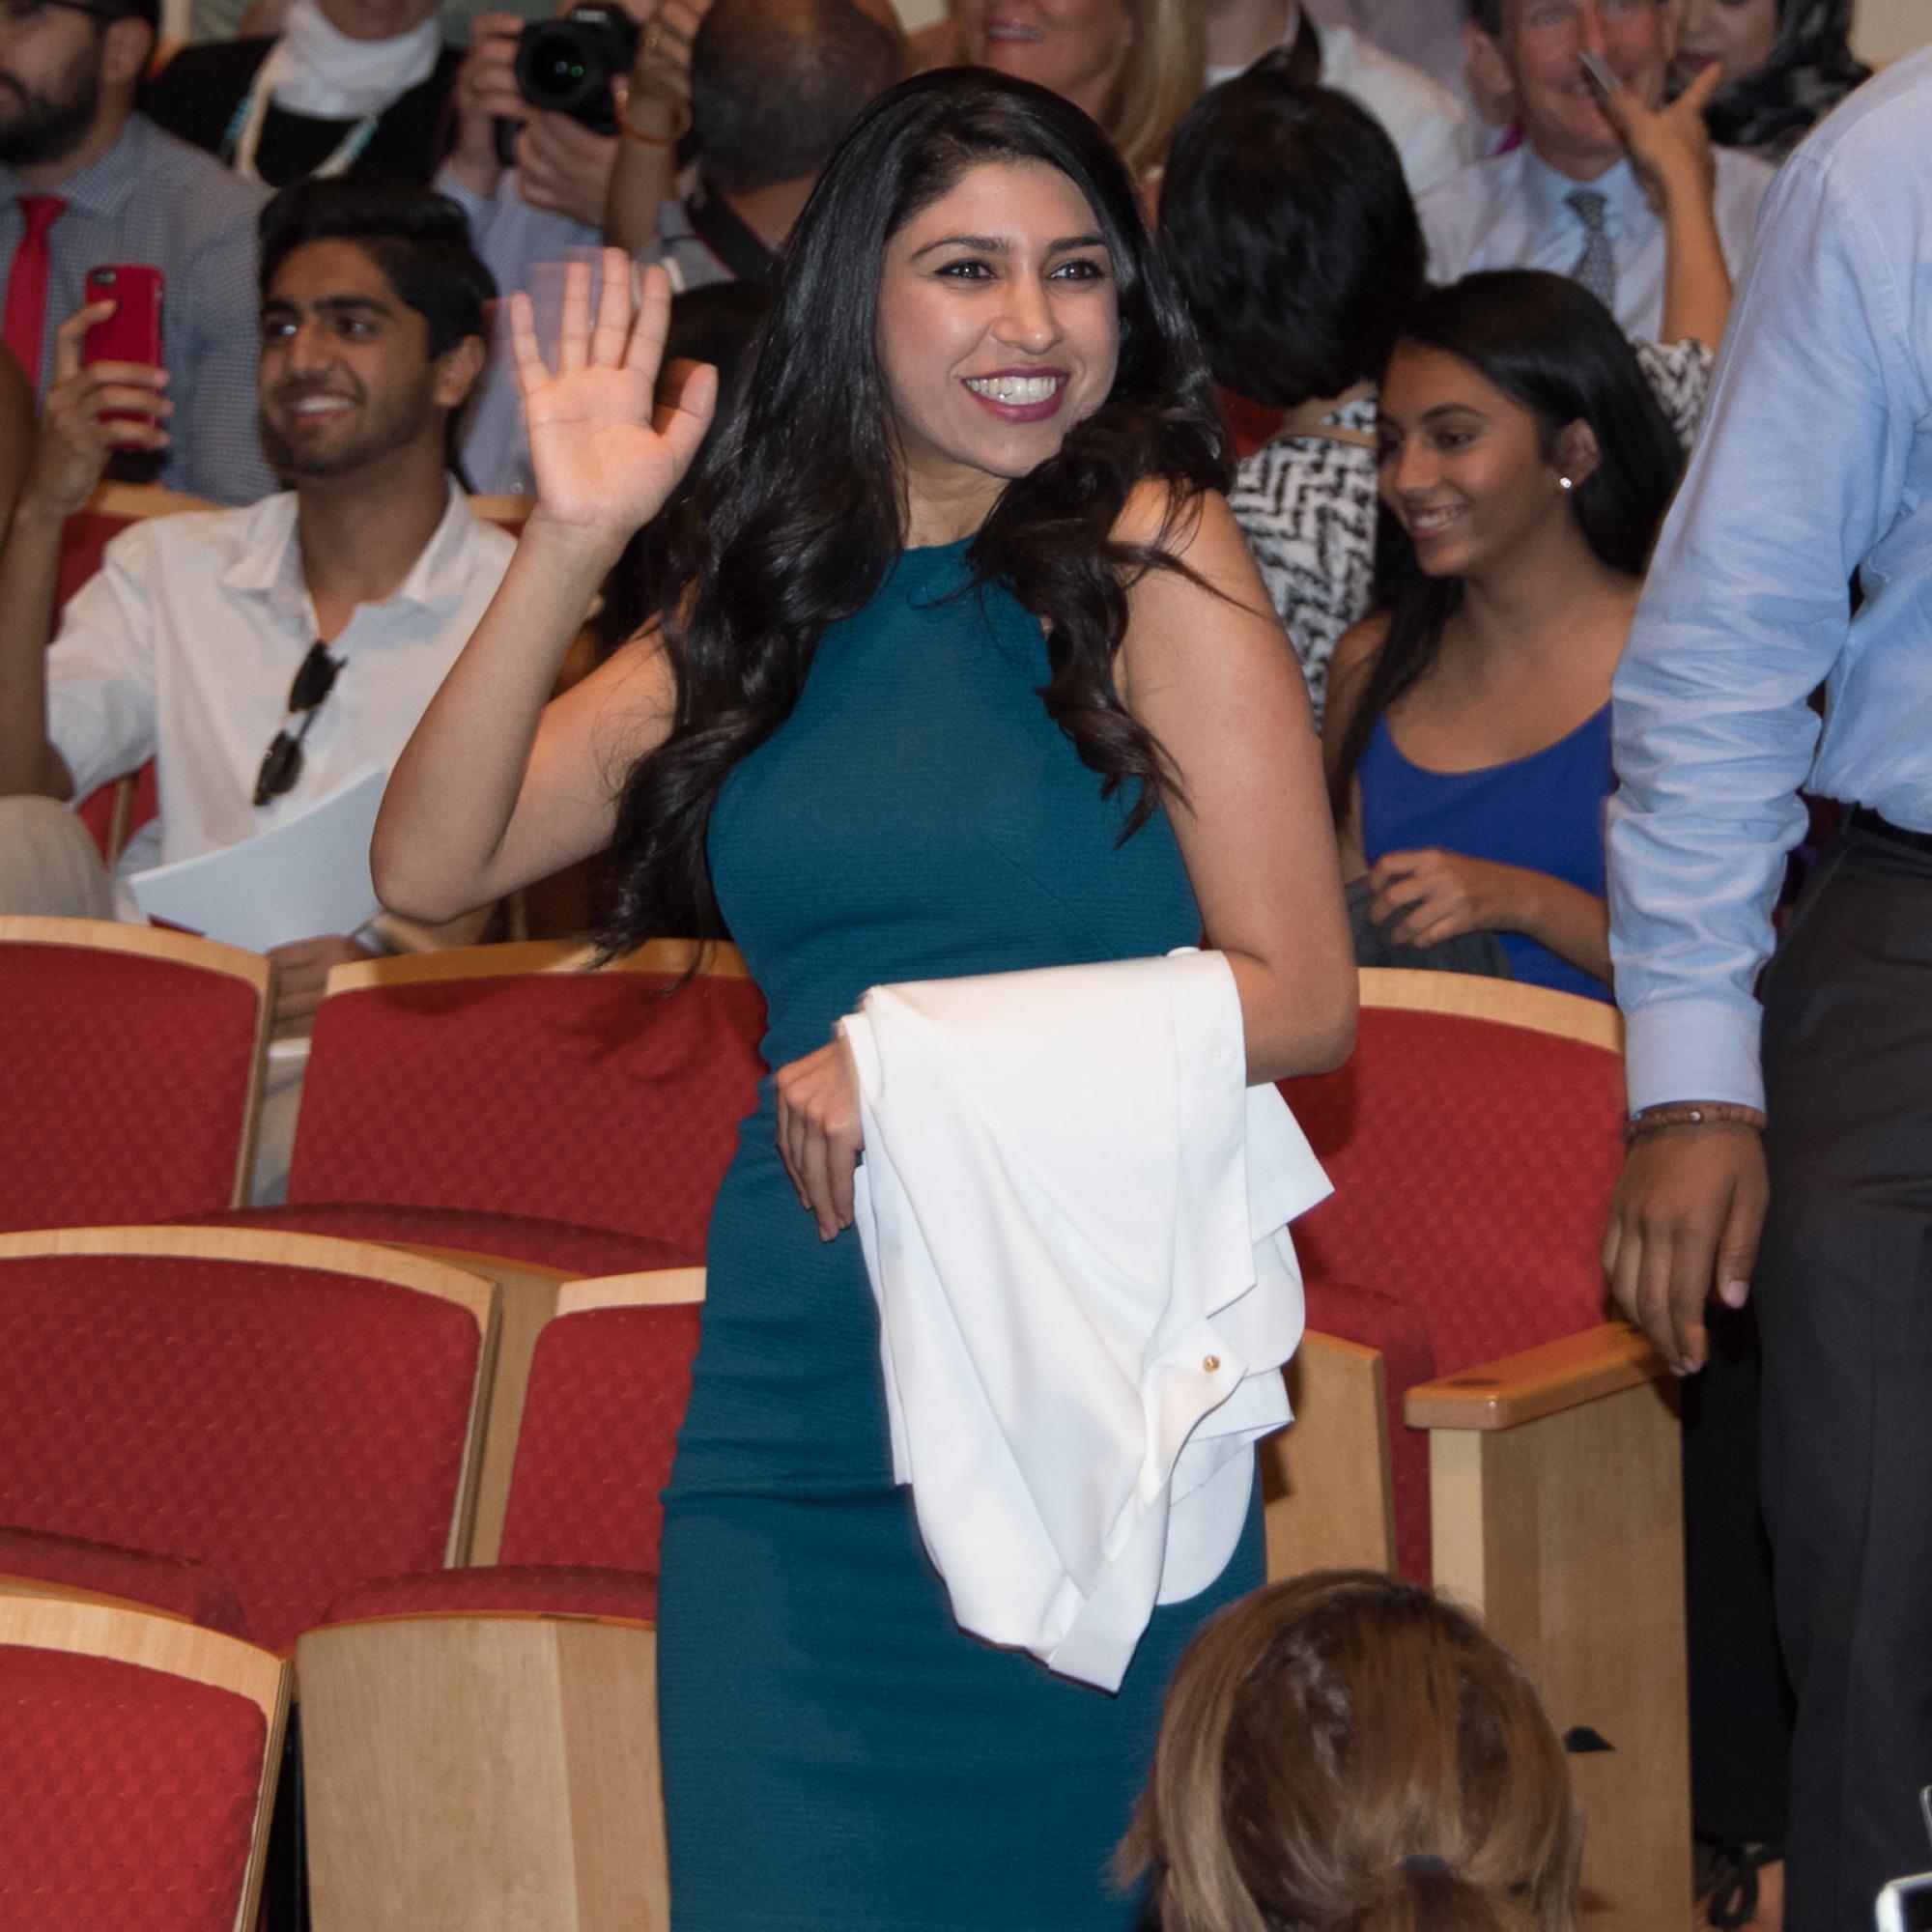 First-year medical student Sarah Javaherifar waves to family.